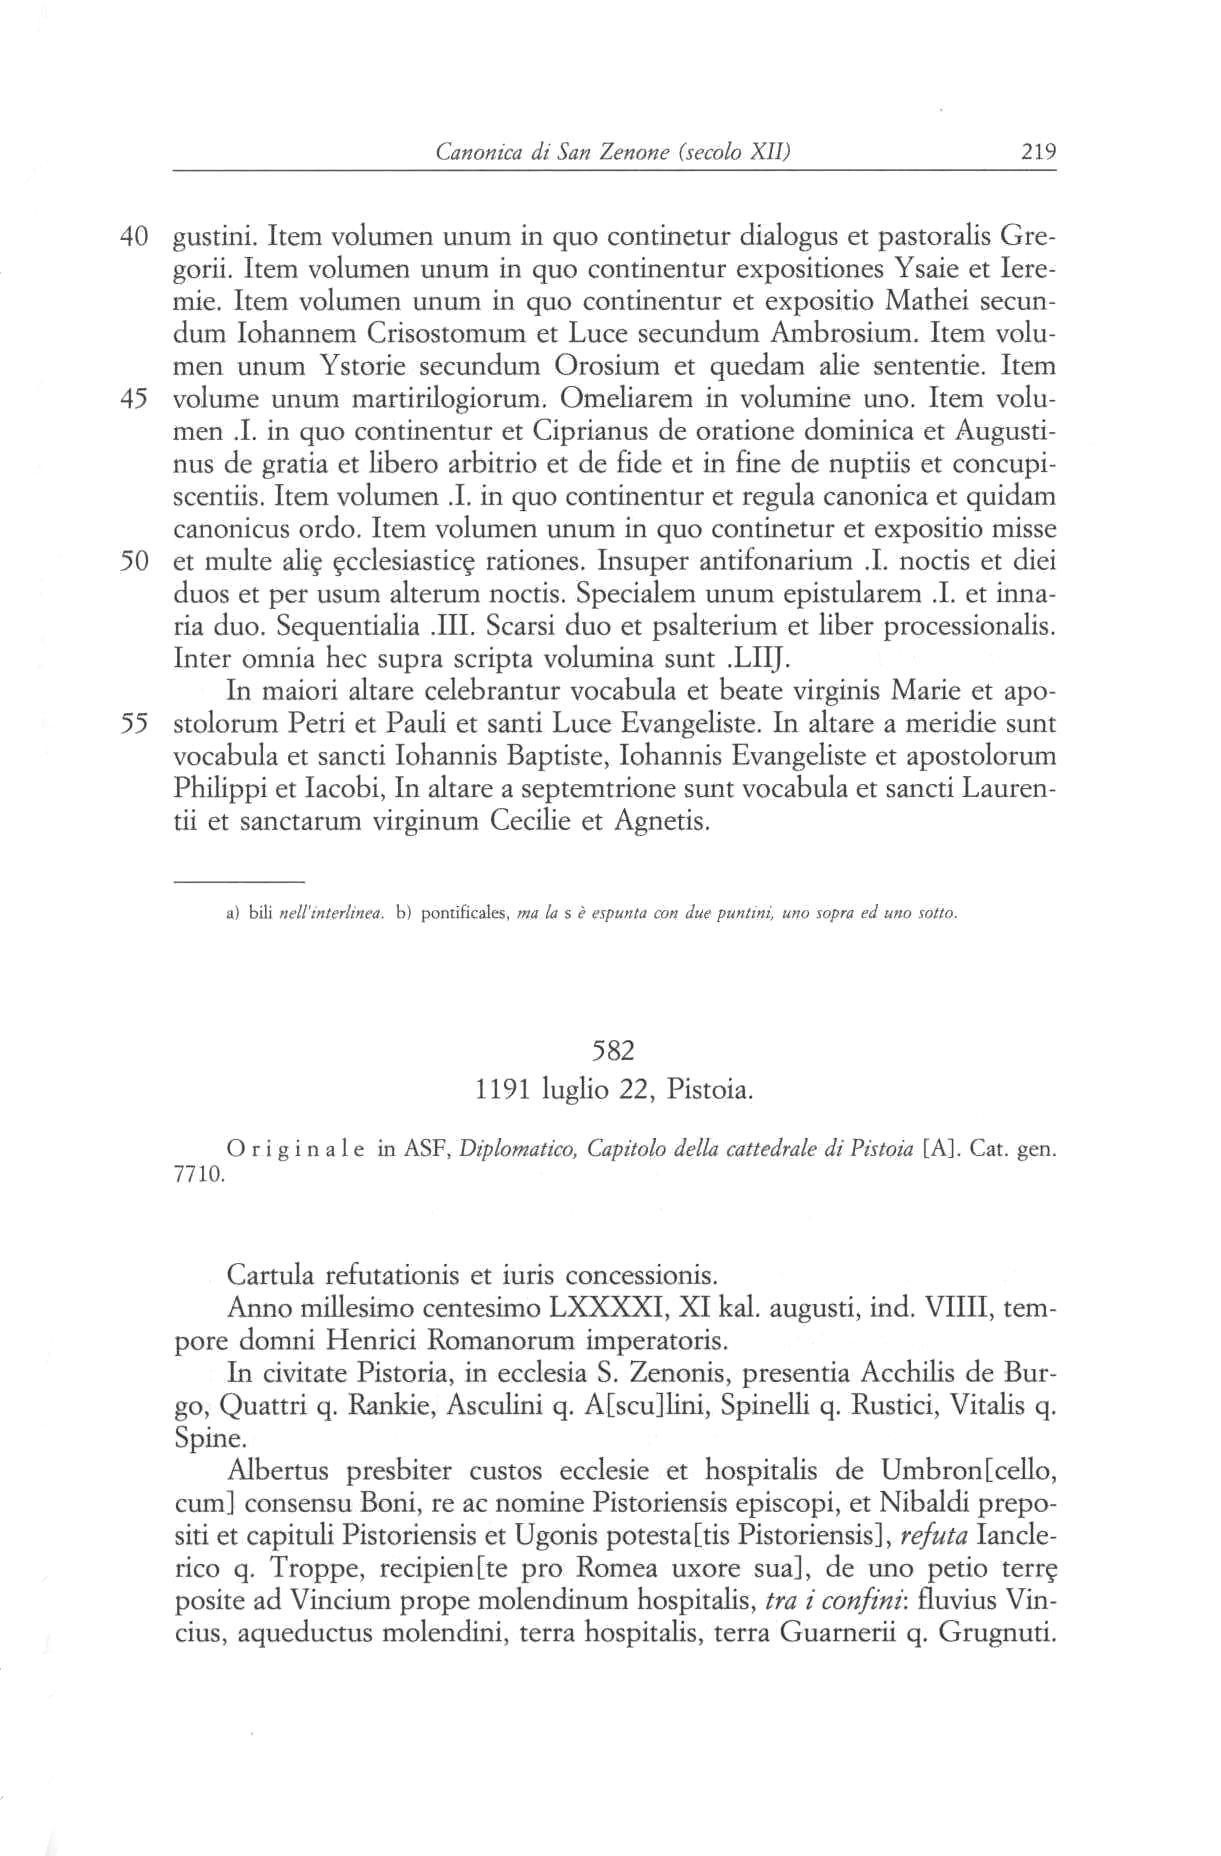 Canonica S. Zenone XII 0219.jpg